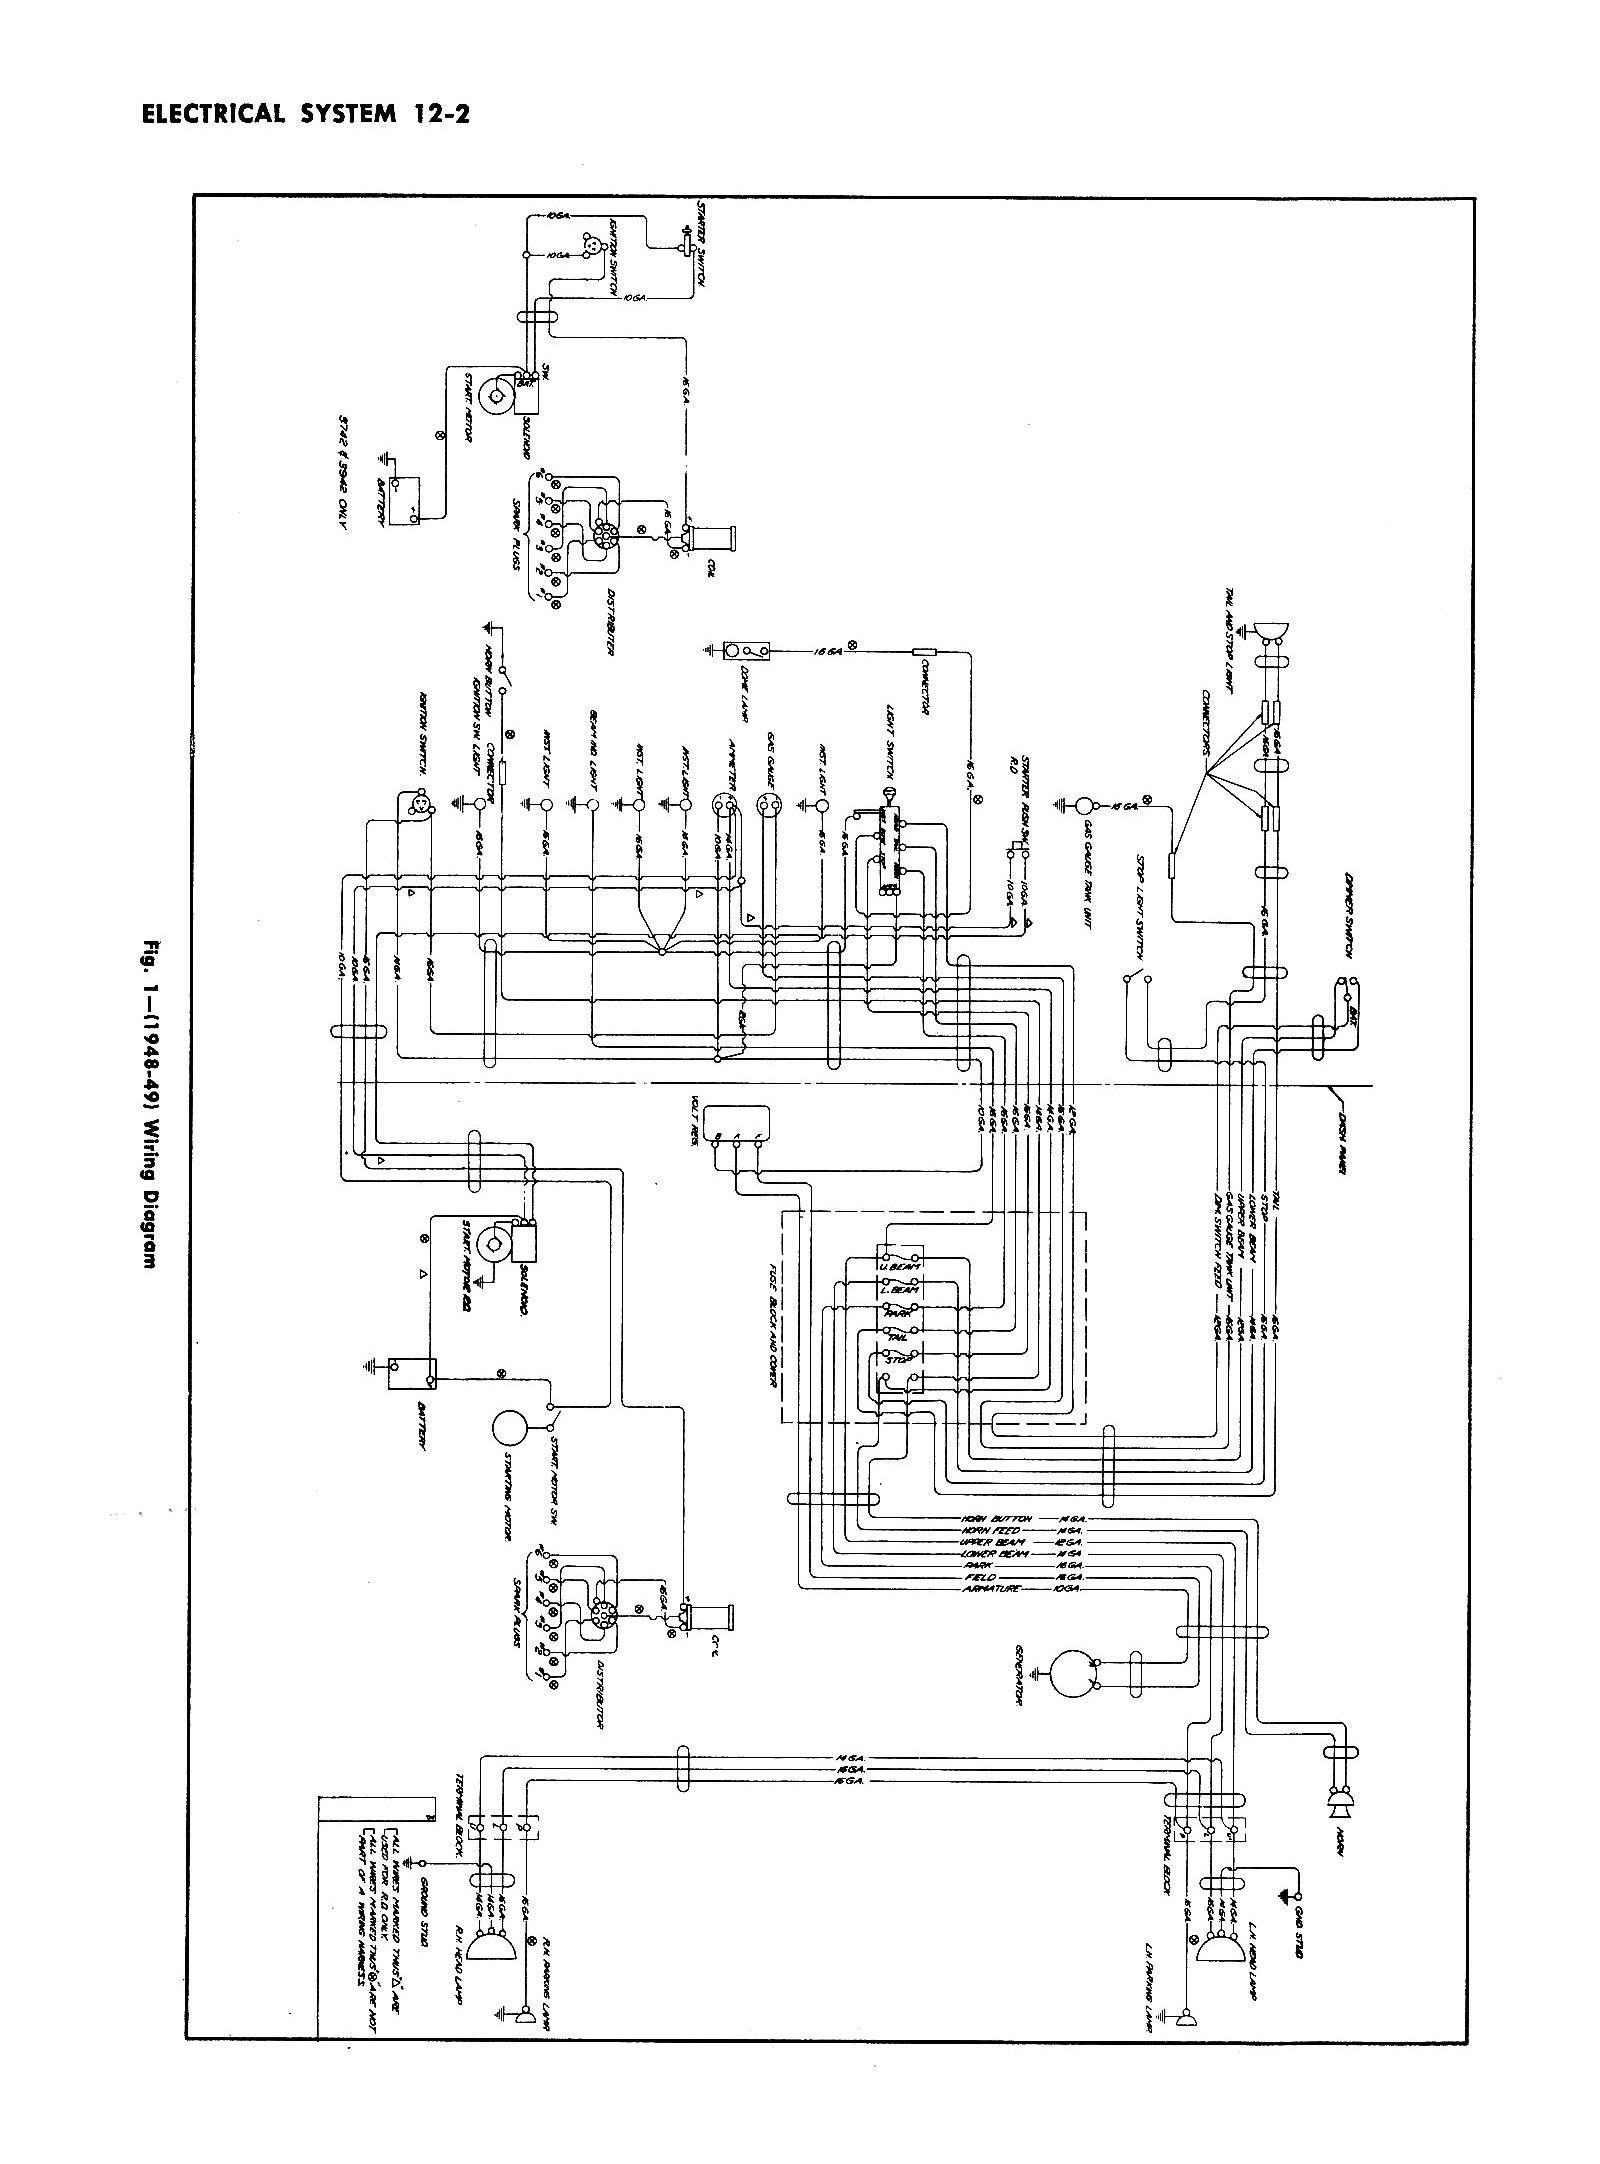 1984 tvr 280i tasmin wiring diagram   35 wiring diagram images